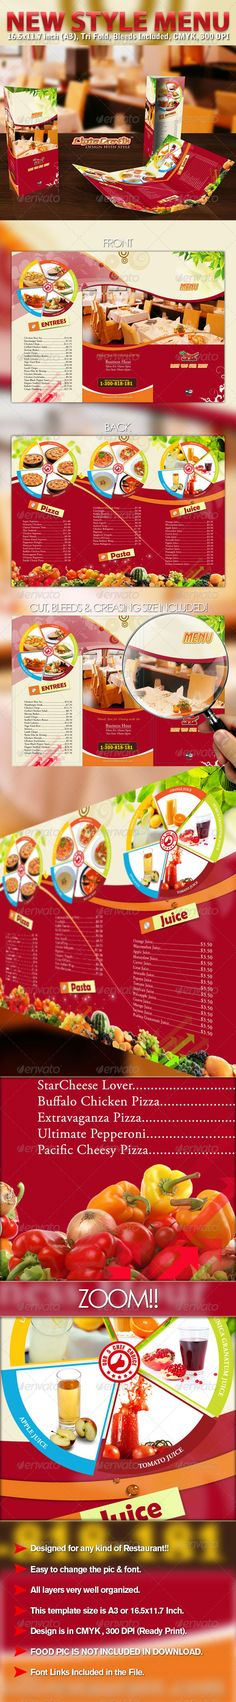 New Style Menu Informational Brochure Template by ciptagrafik. Print Templates, Resume Templates, Brochure Template, Follow Insta, Doodle Drawing, Powerpoint Tutorial, Menu Restaurant, Food Menu, Fonts